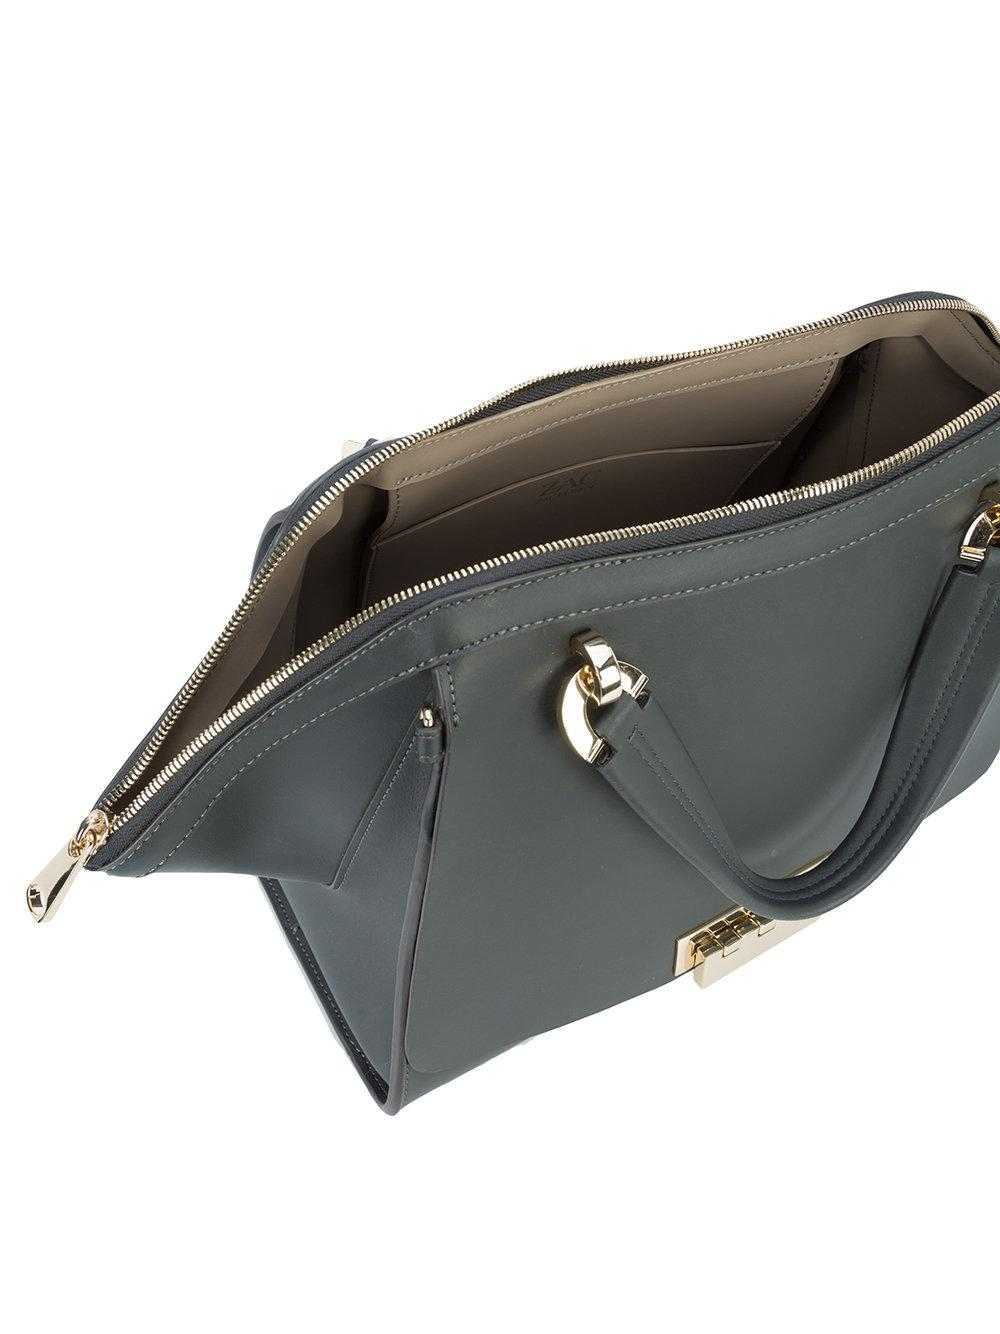 Zac Zac Posen Leather Large Tote Bag in Grey (Grey)